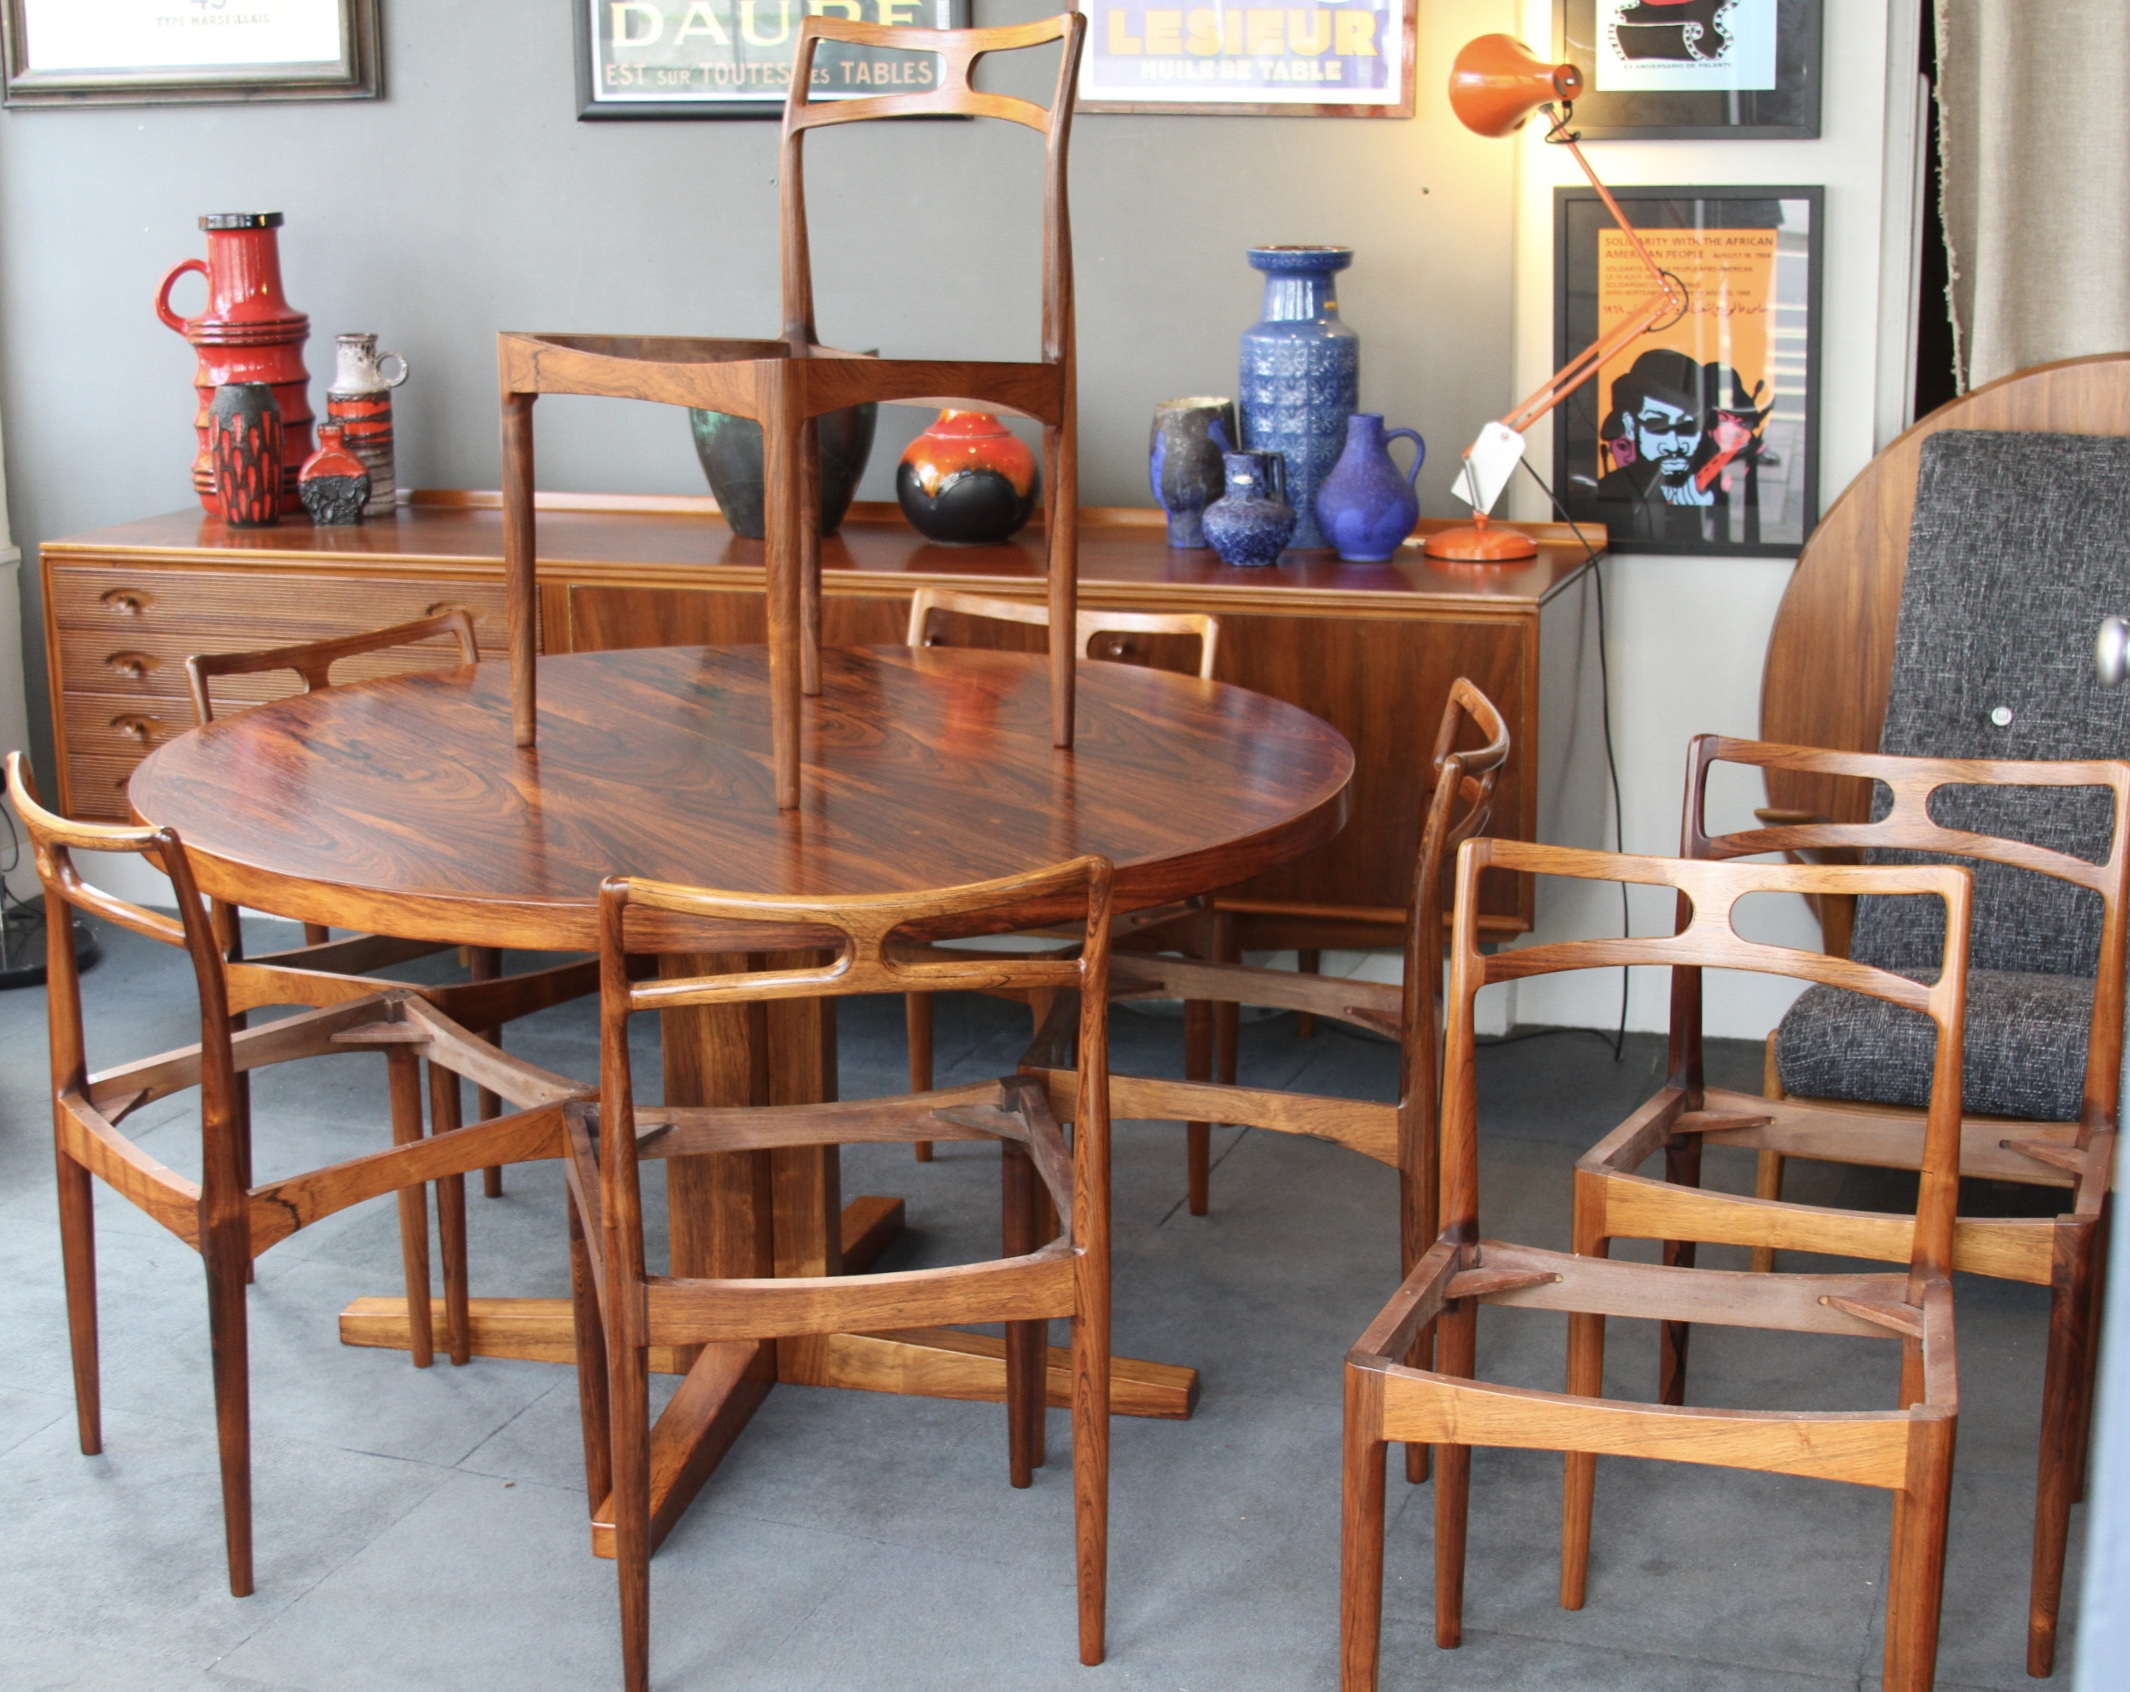 Set 8 Rosewood Chairs - Johannes Andersen £2500